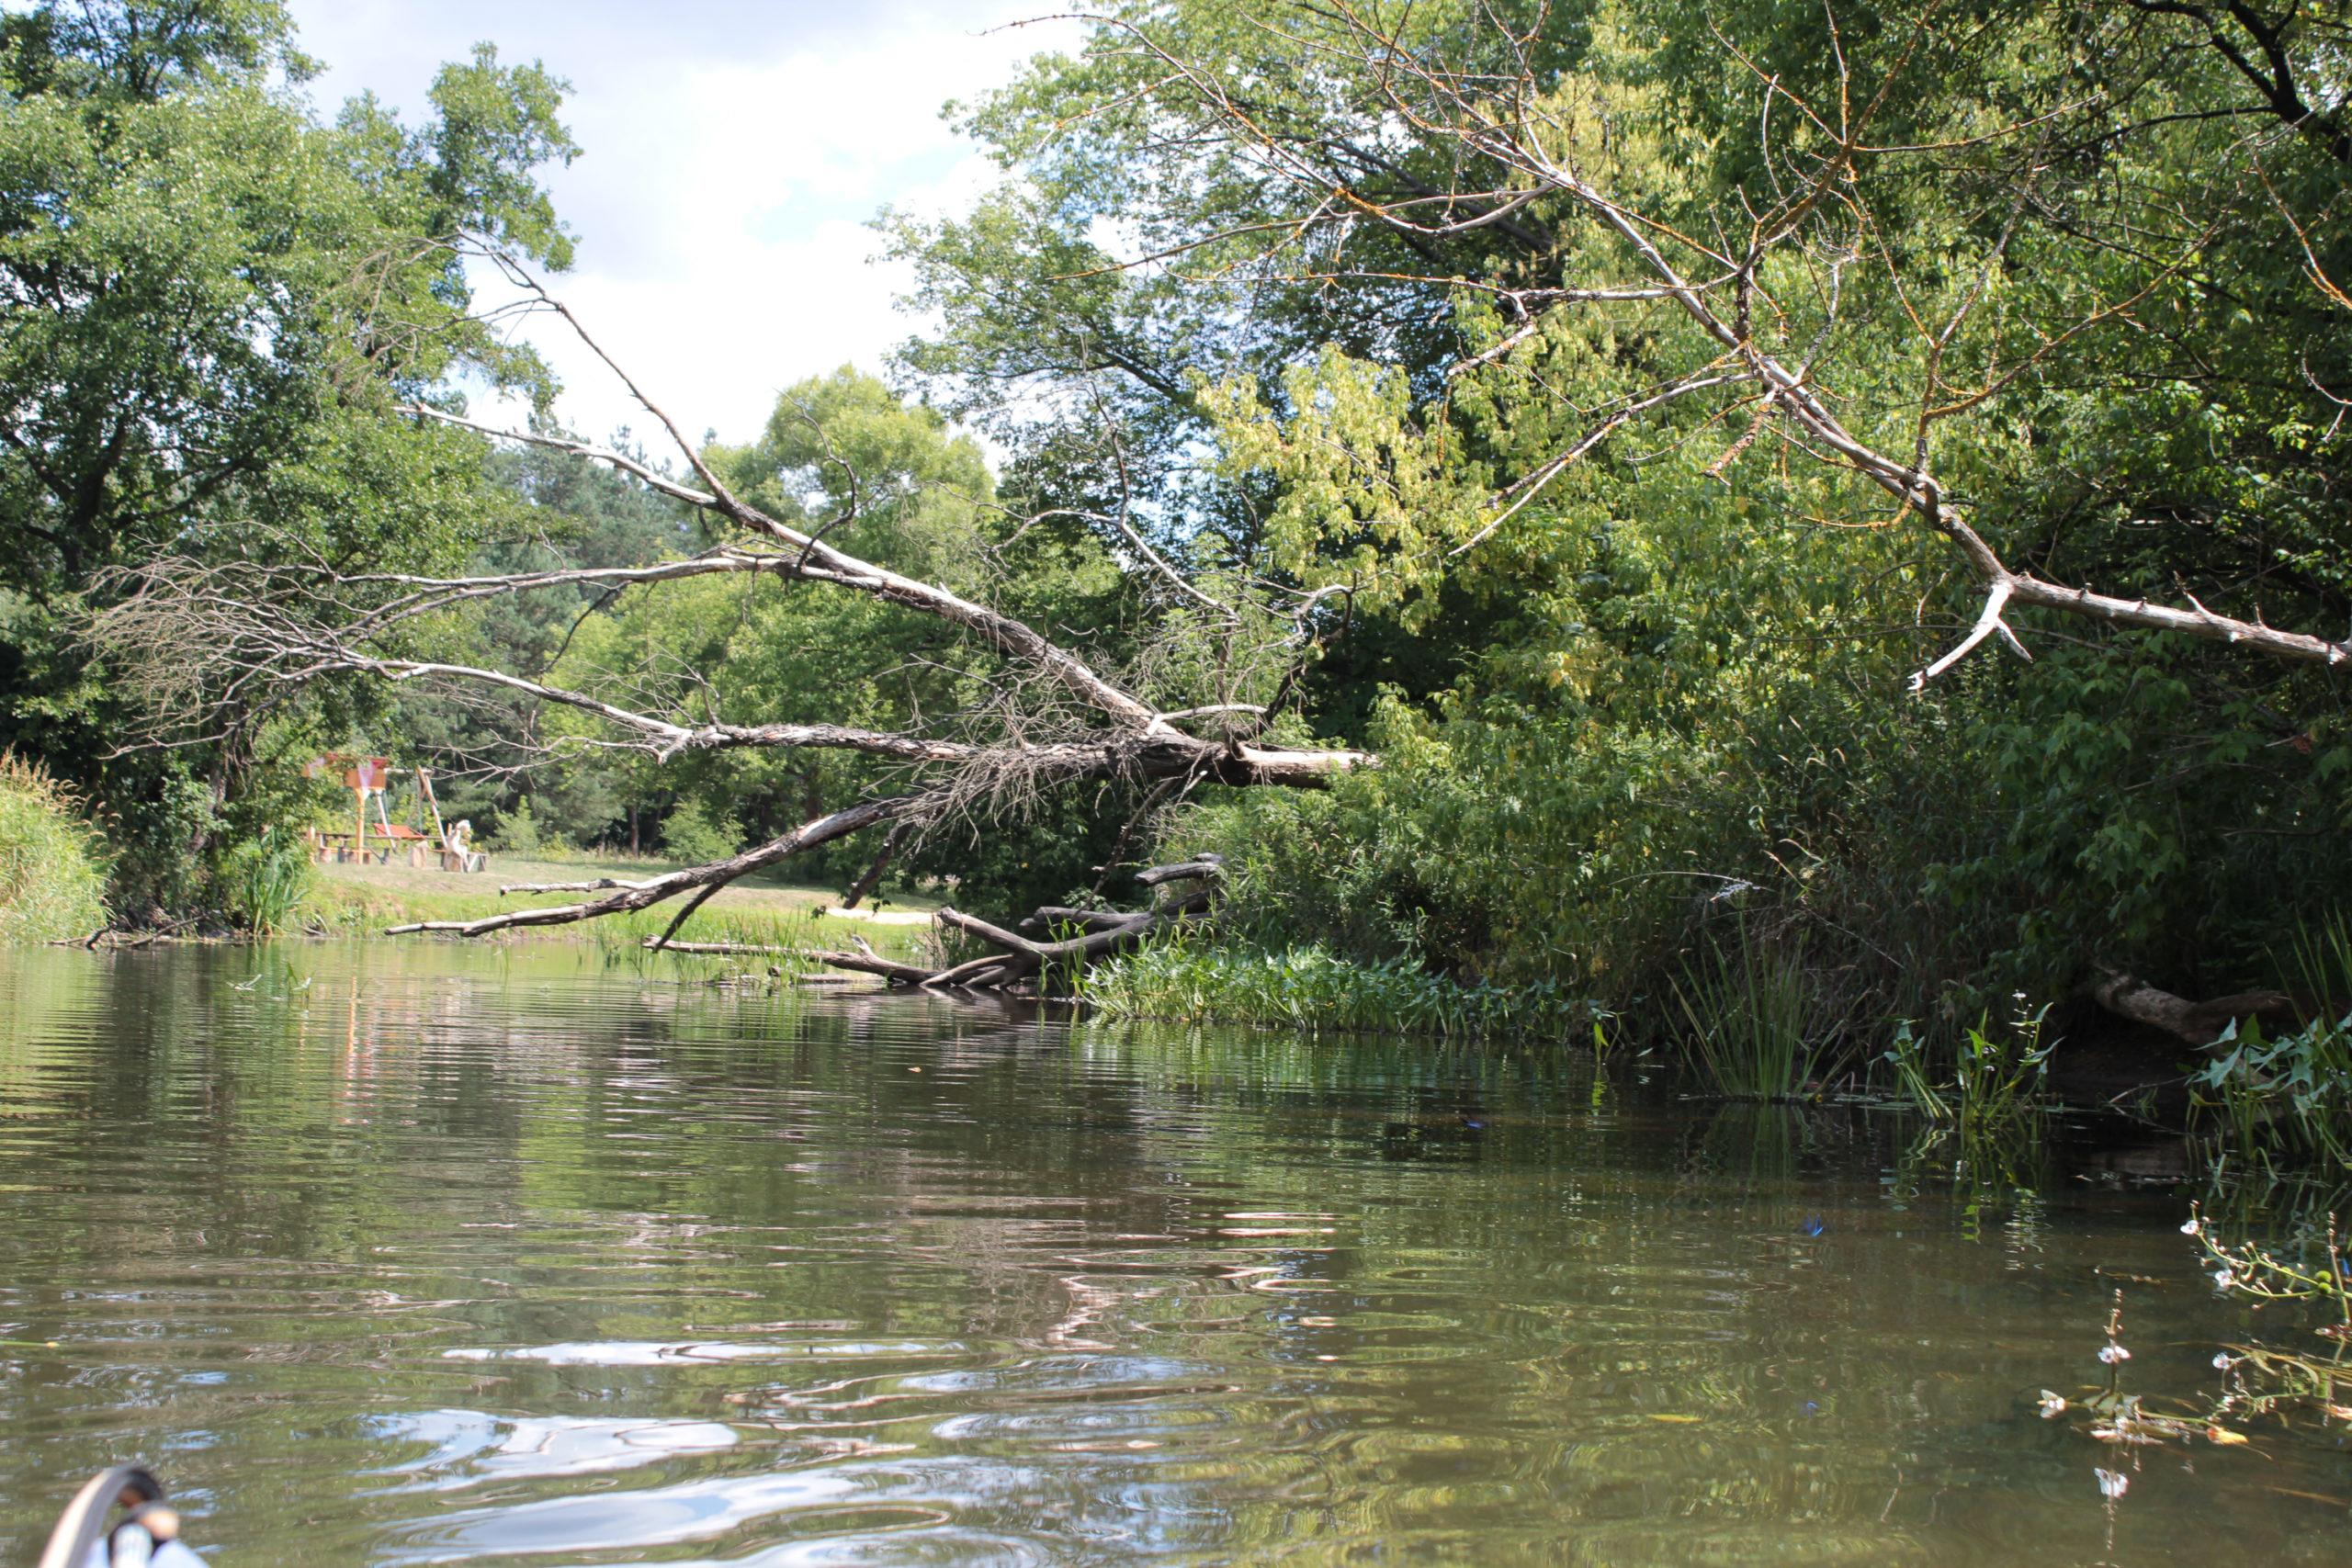 rzeka i drzewa